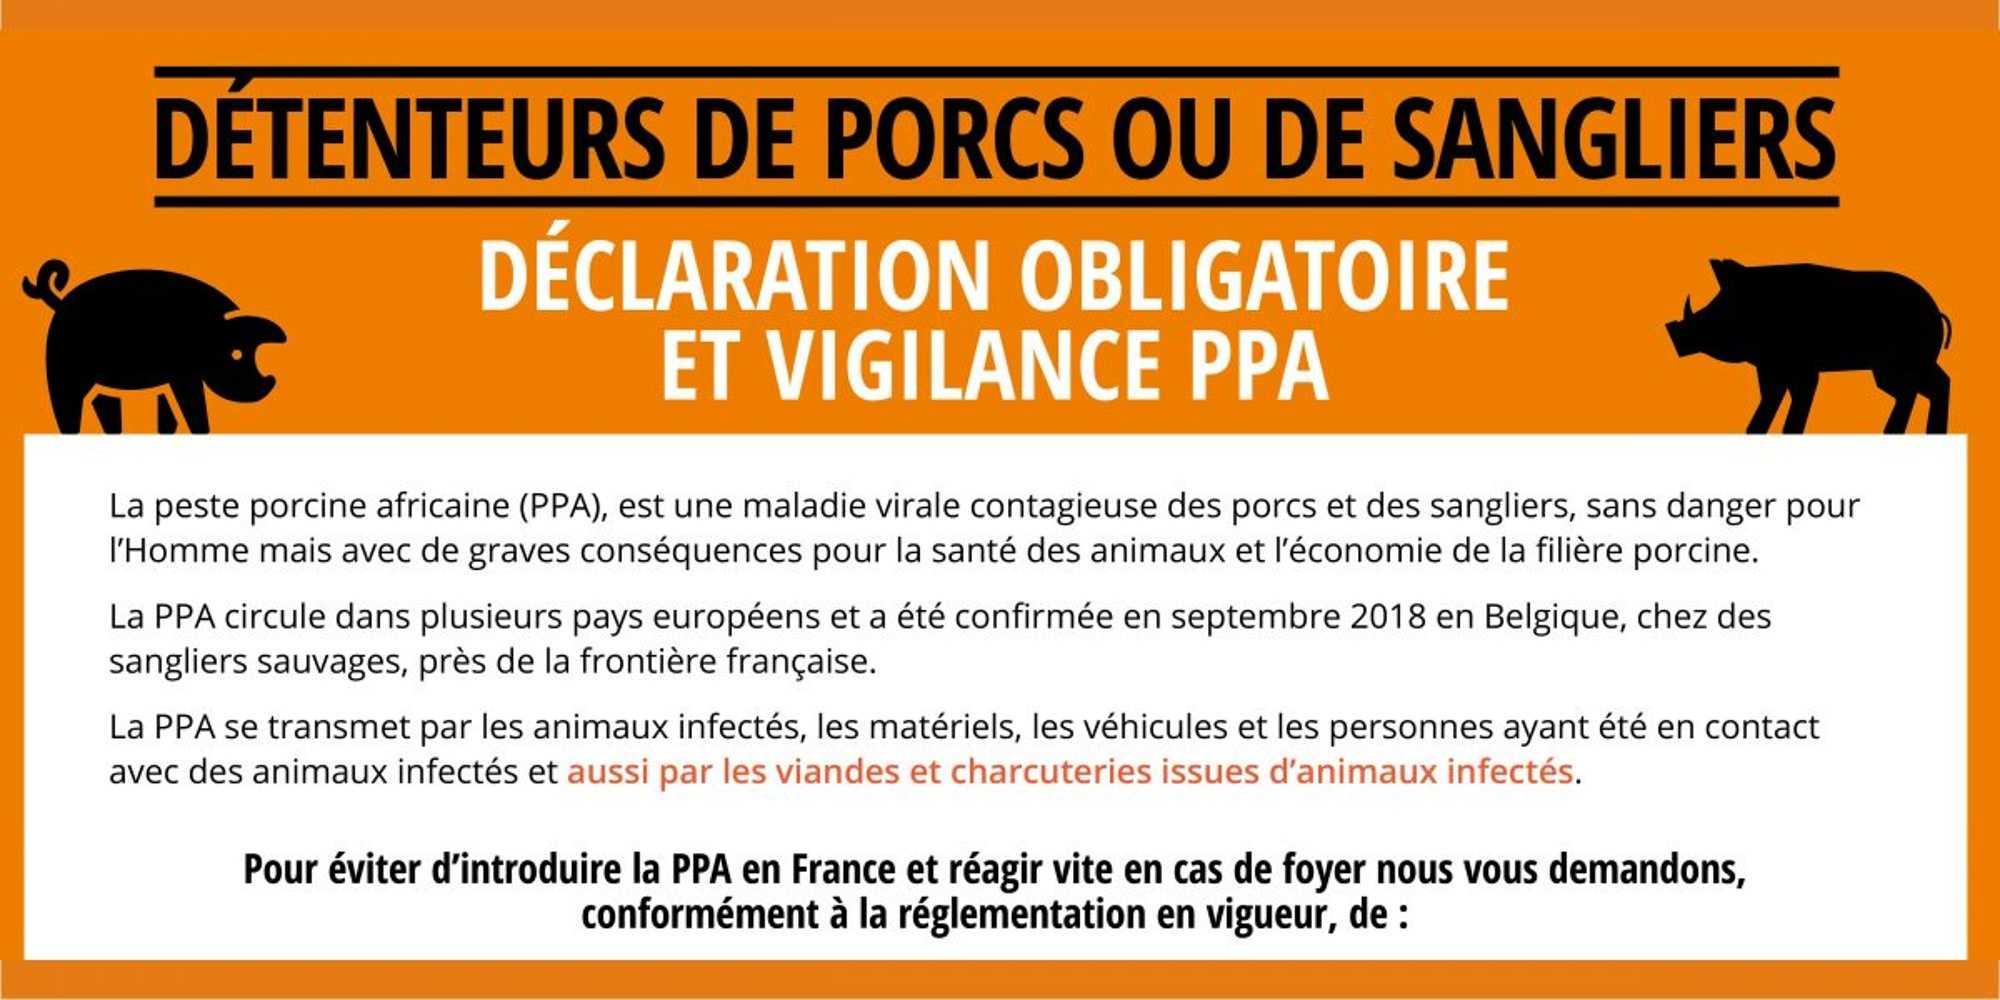 Vigilance Peste Porcine Africaine (PPA) 0